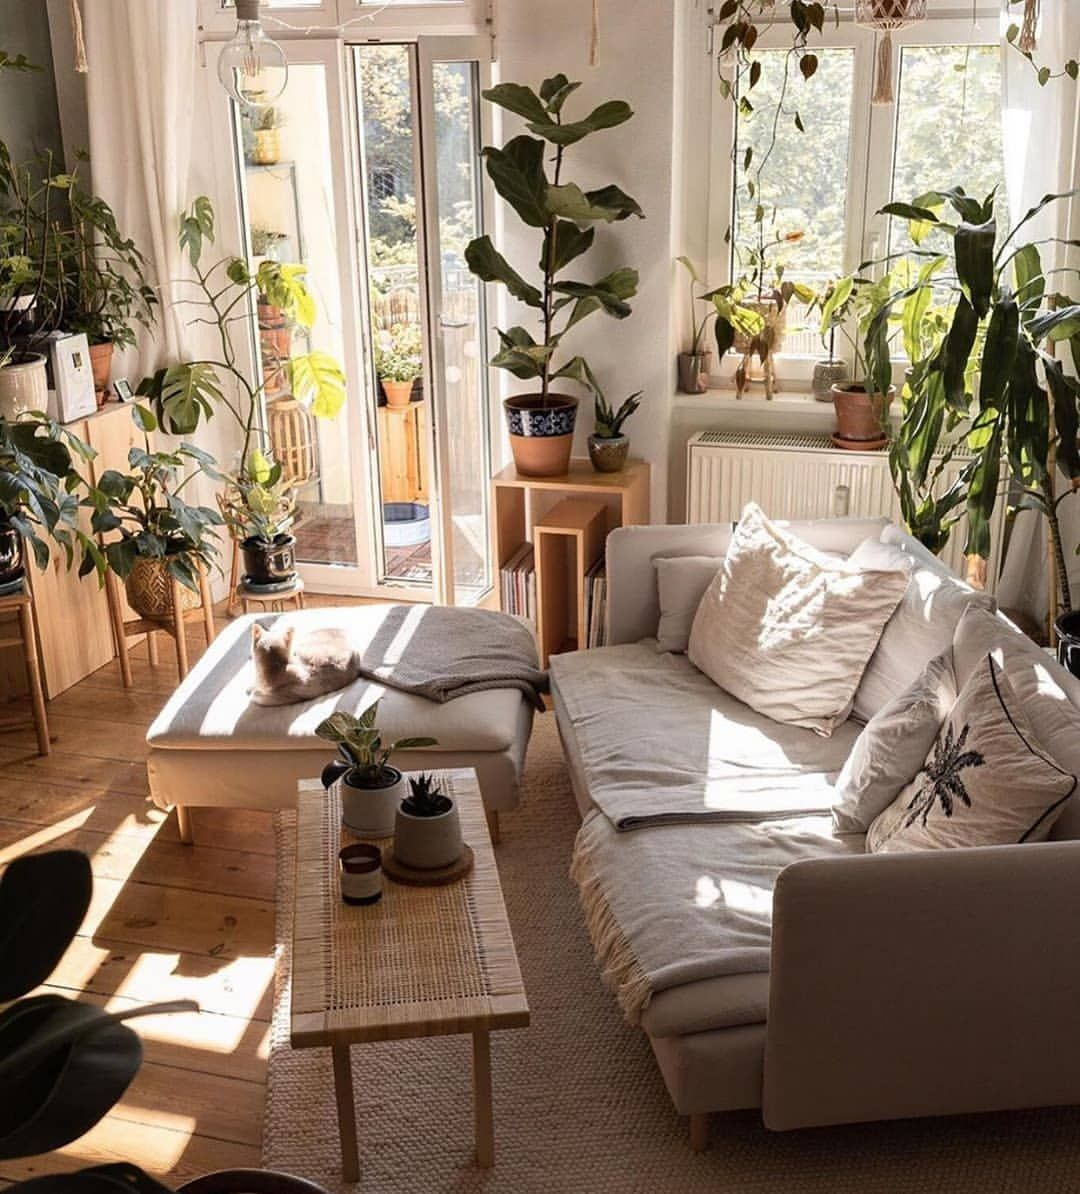 "𝐈𝐧𝐭𝐞𝐫𝐢𝐨𝐫𝐲𝐞𝐬𝐩𝐥𝐳 ® az Instagramon: ""✨ Zen Place ✨ . . Thanks for tagging me girl!😻 . . 📷: @caropeony . . #interioryesplz #apartmentherapy #apartmentjungle #cozyroom #cozyplace…"""